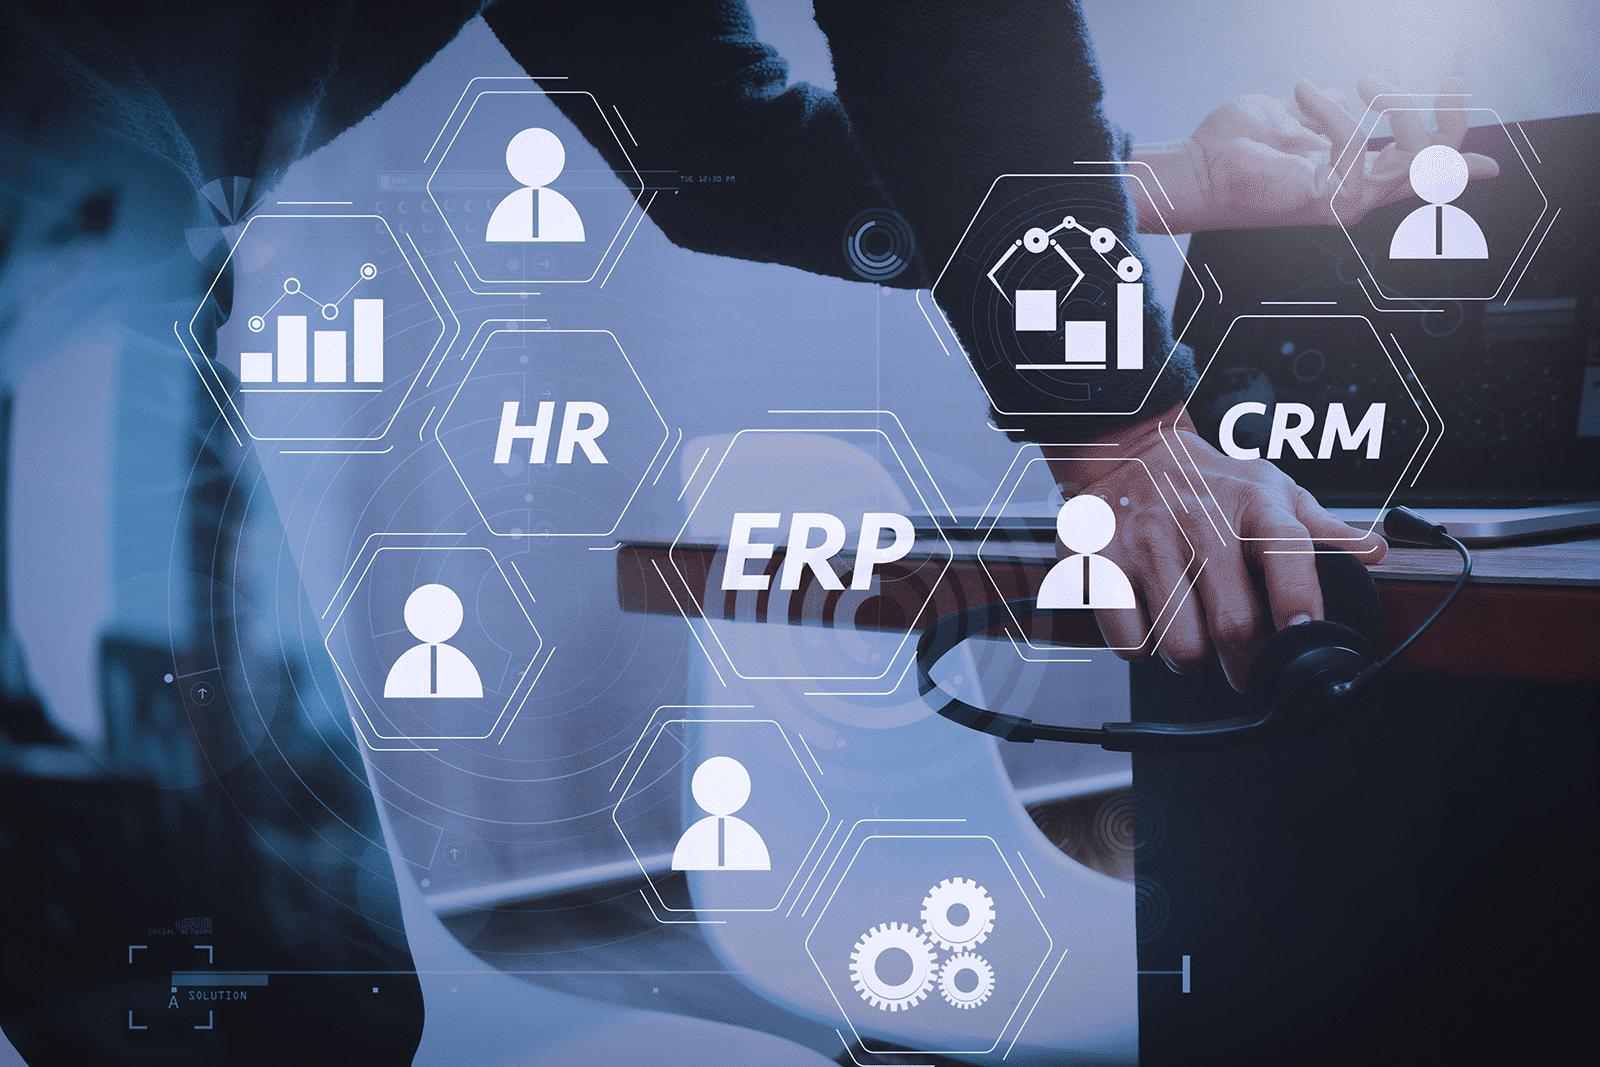 smeup Software contabilità vs CRM vs ERP